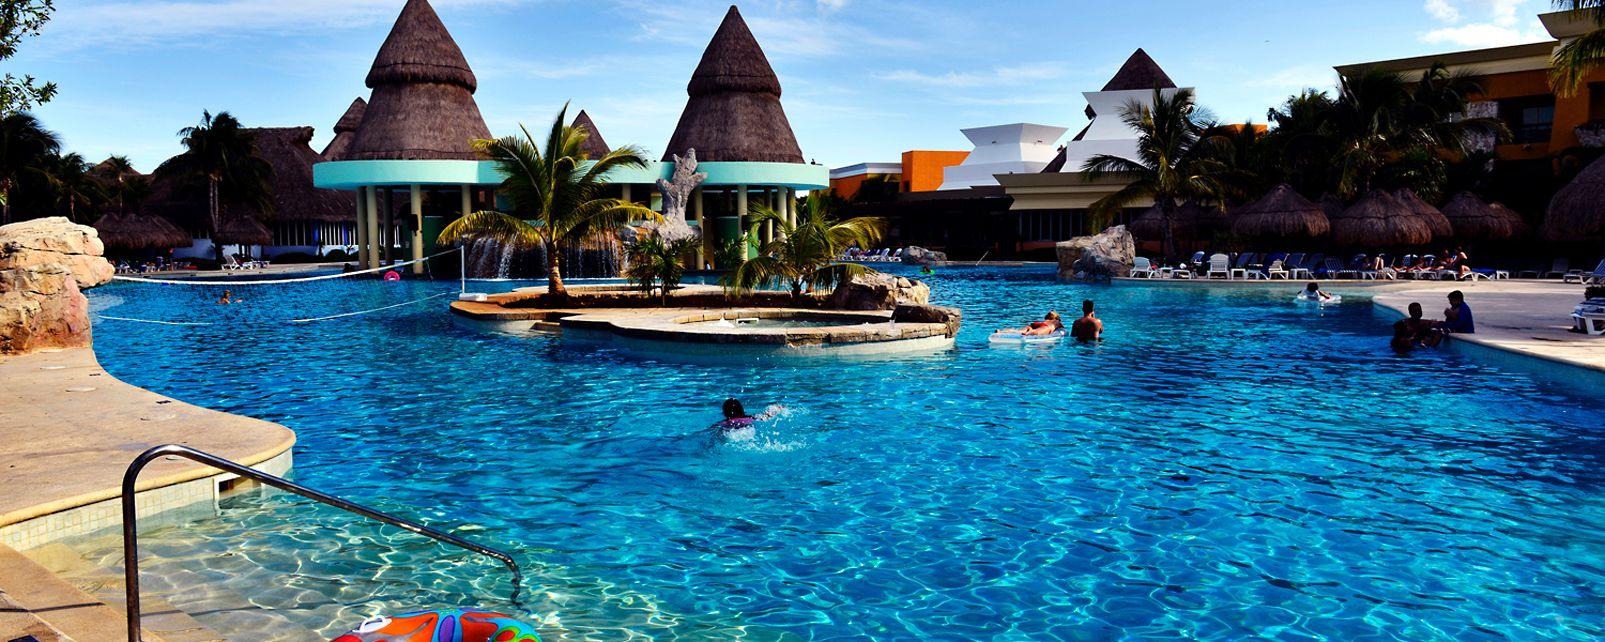 Hotel Iberostar Paraiso del Mar & Beach